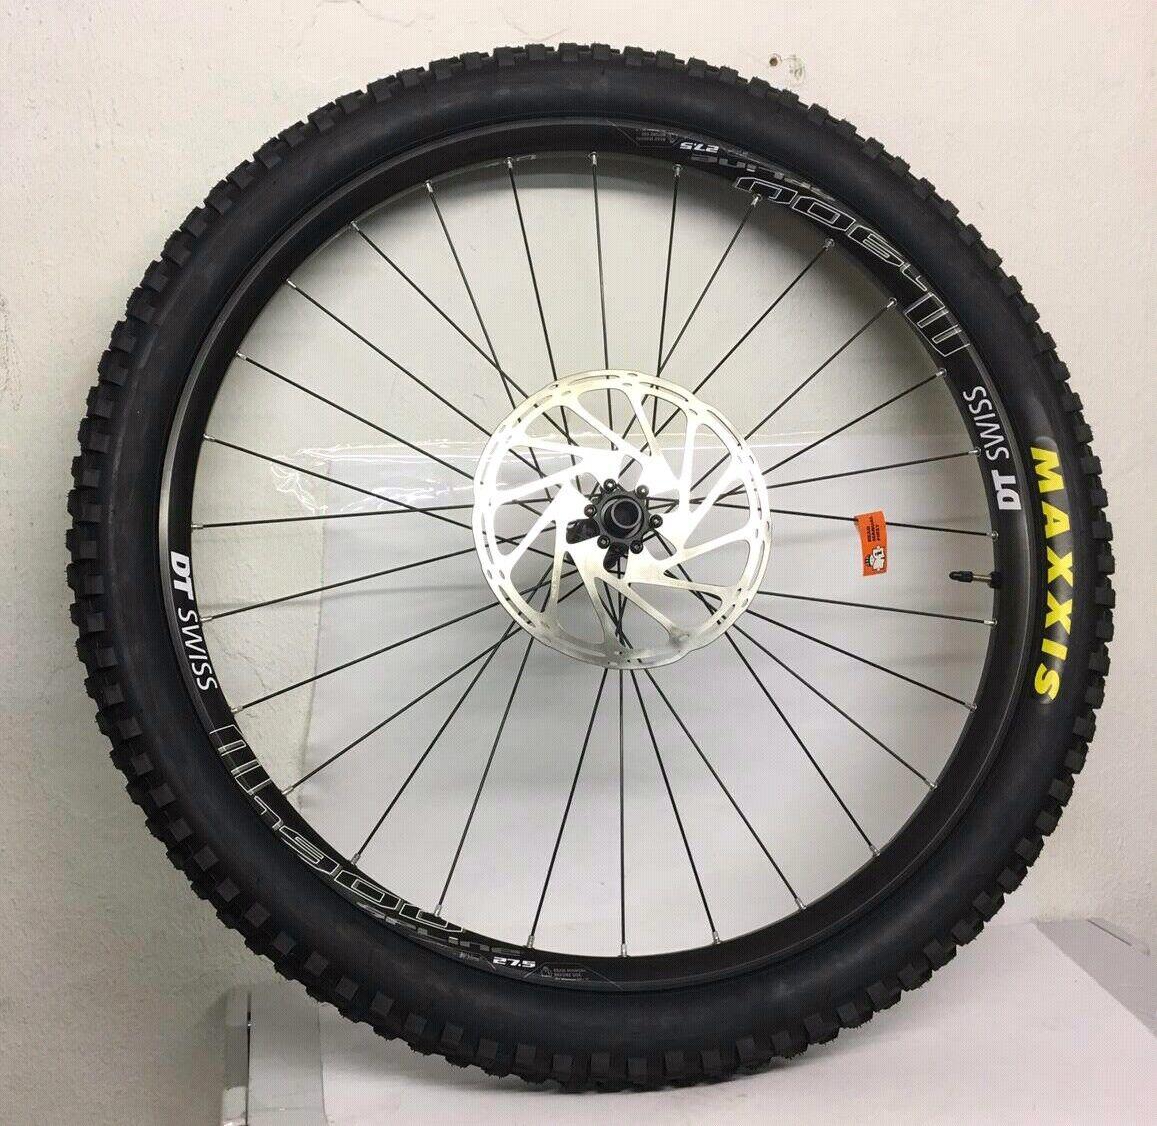 DT swiss M 1900 Spline 27,5  CL TA Shimano Wheel with Disc break and Maxxis tyer